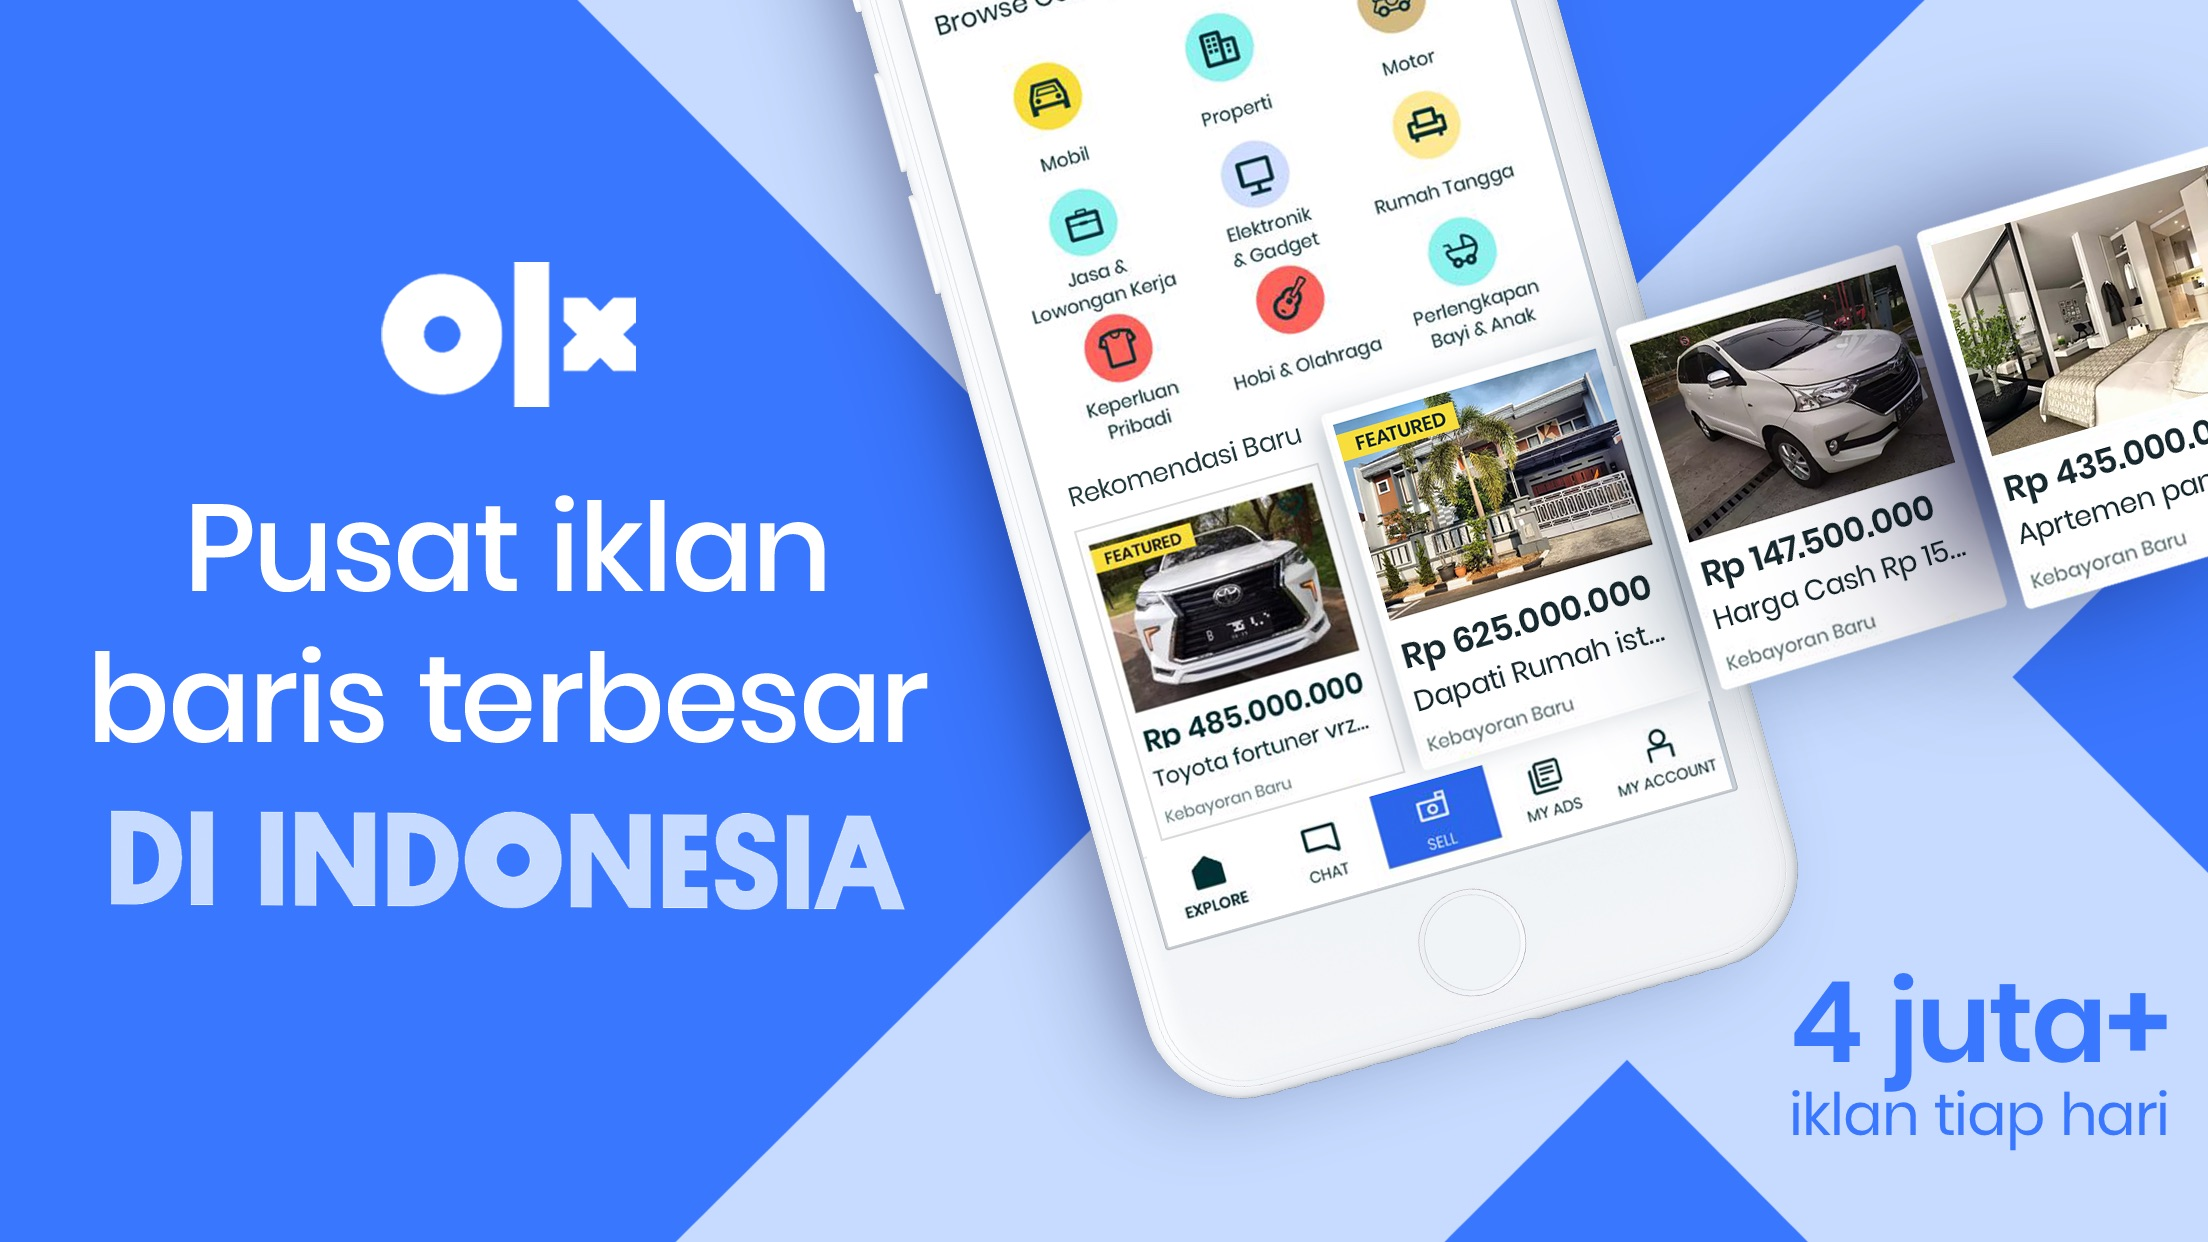 OLX Indonesia Screenshot